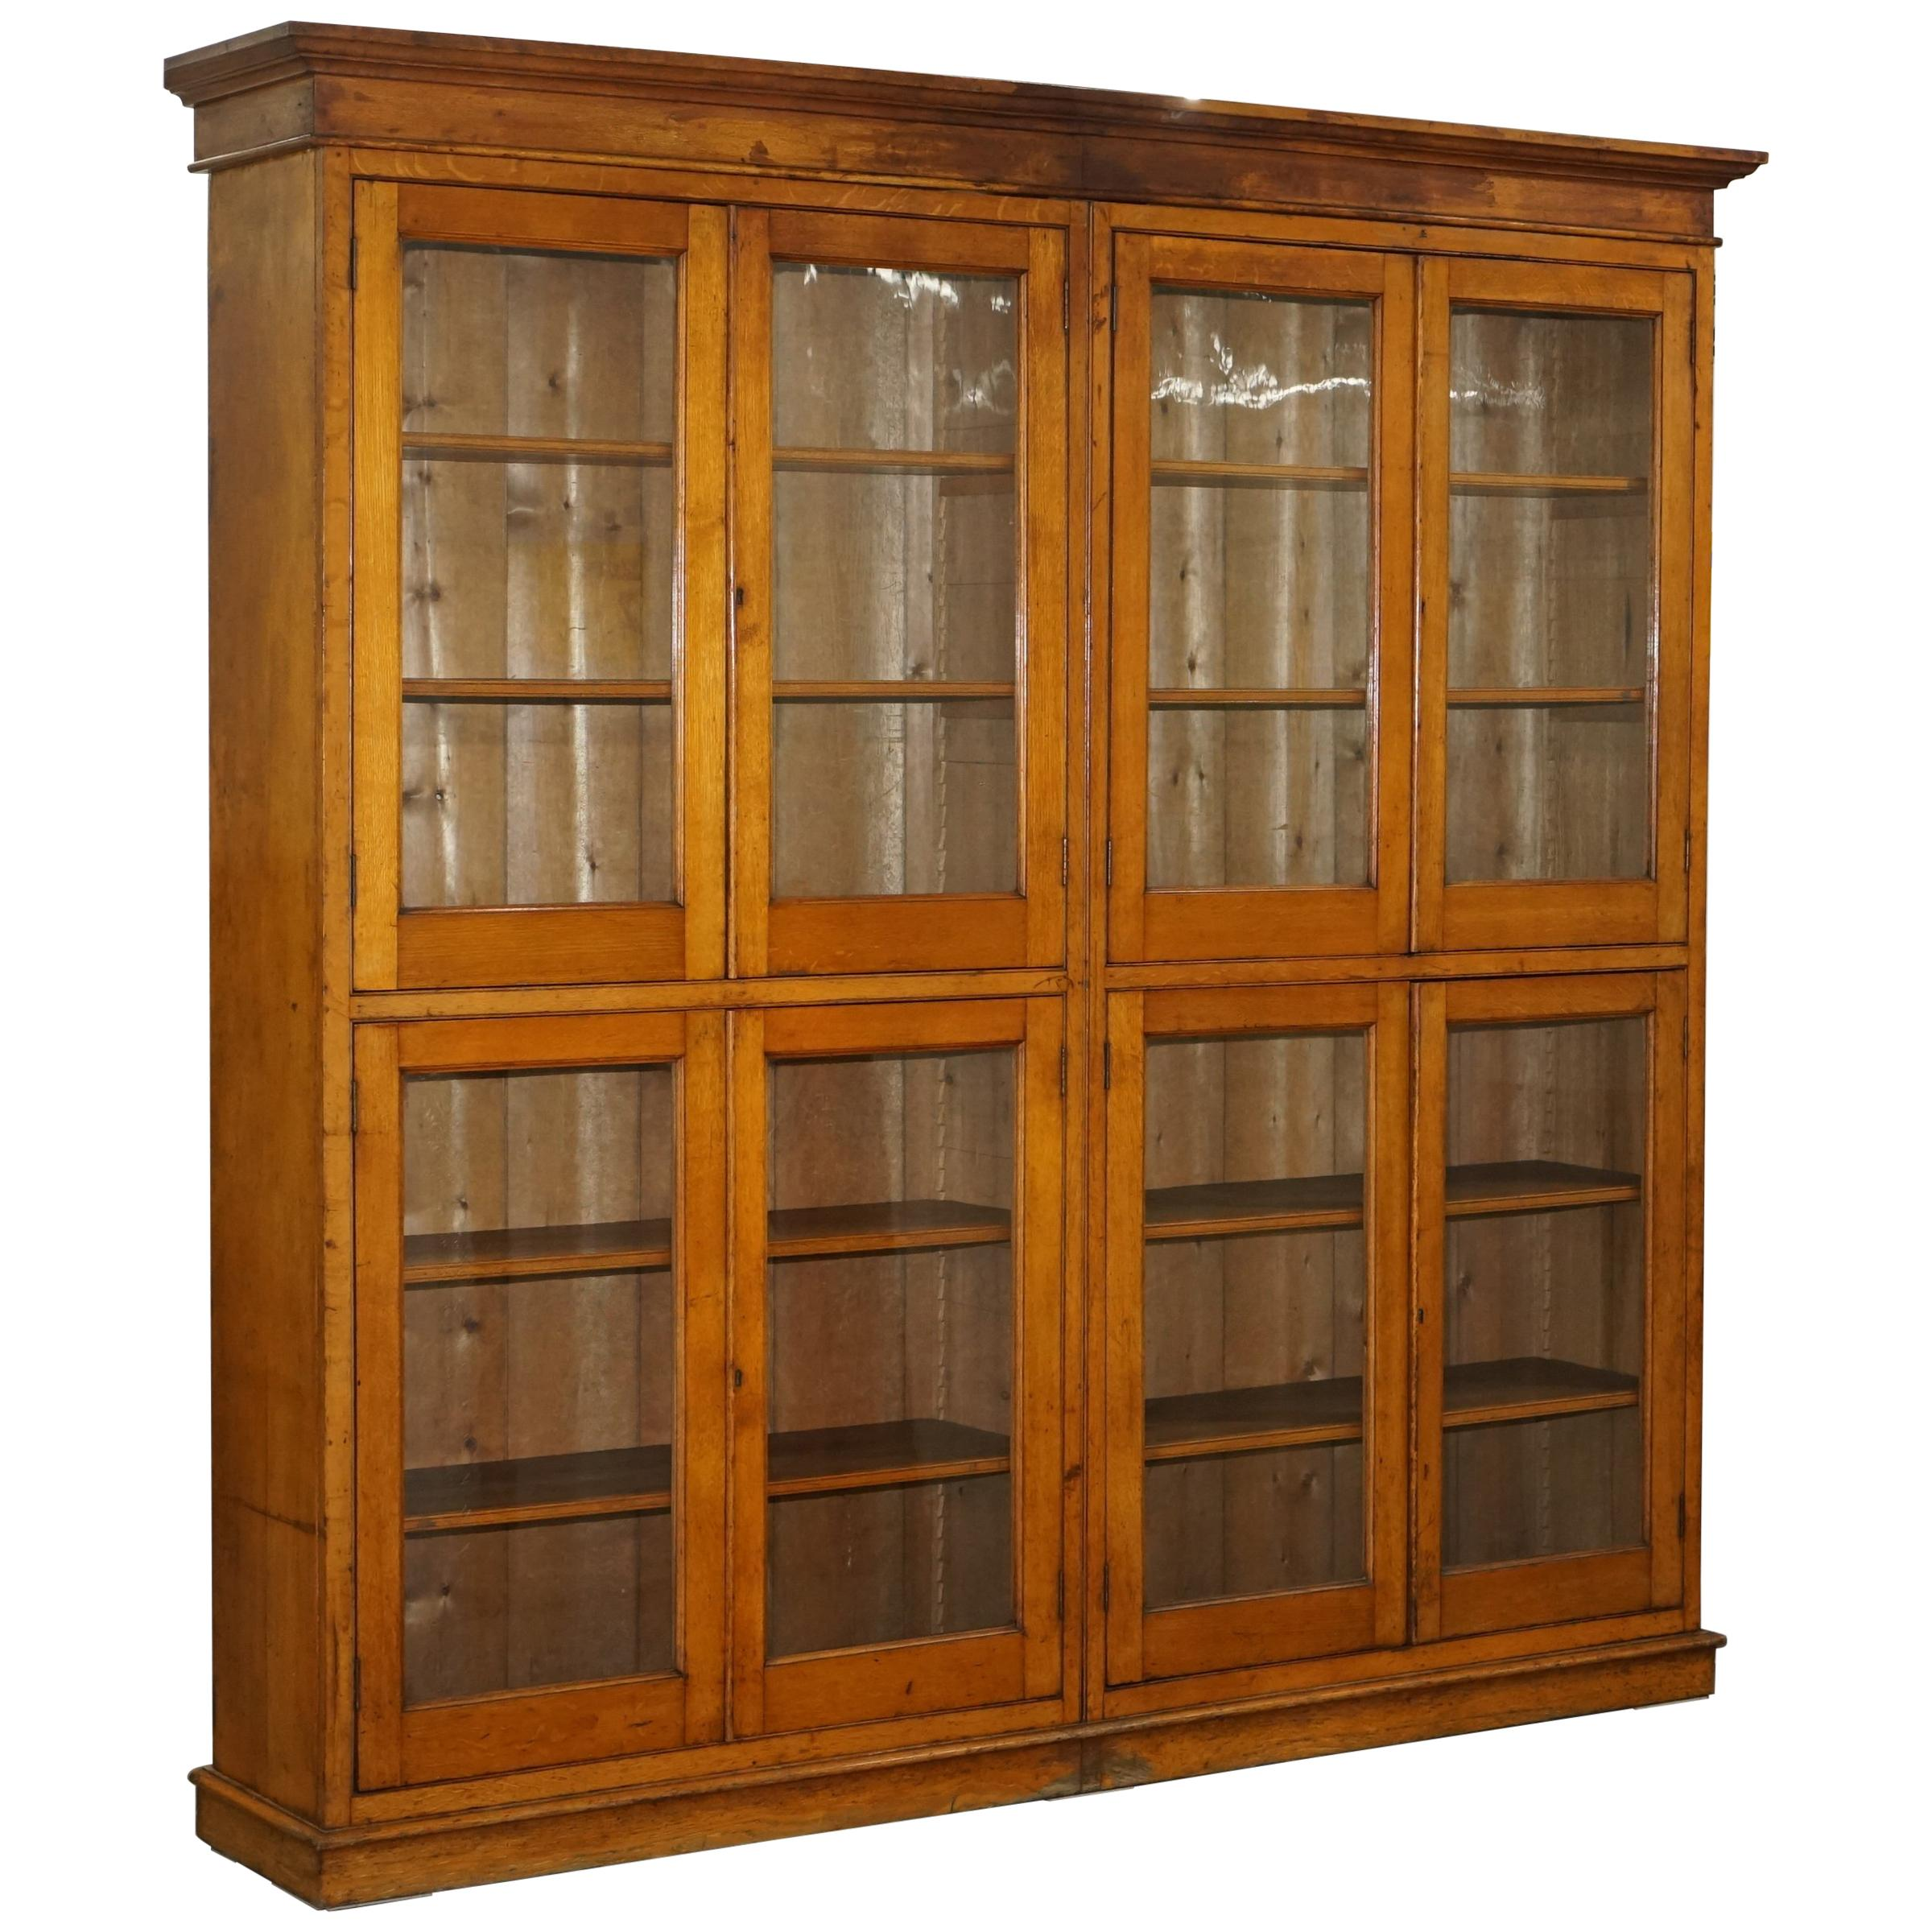 Merveilleux Victorian Mahogany U0026 Oak Library Bookcase Cabinet Adjustable Shelves Glass  Doors For Sale